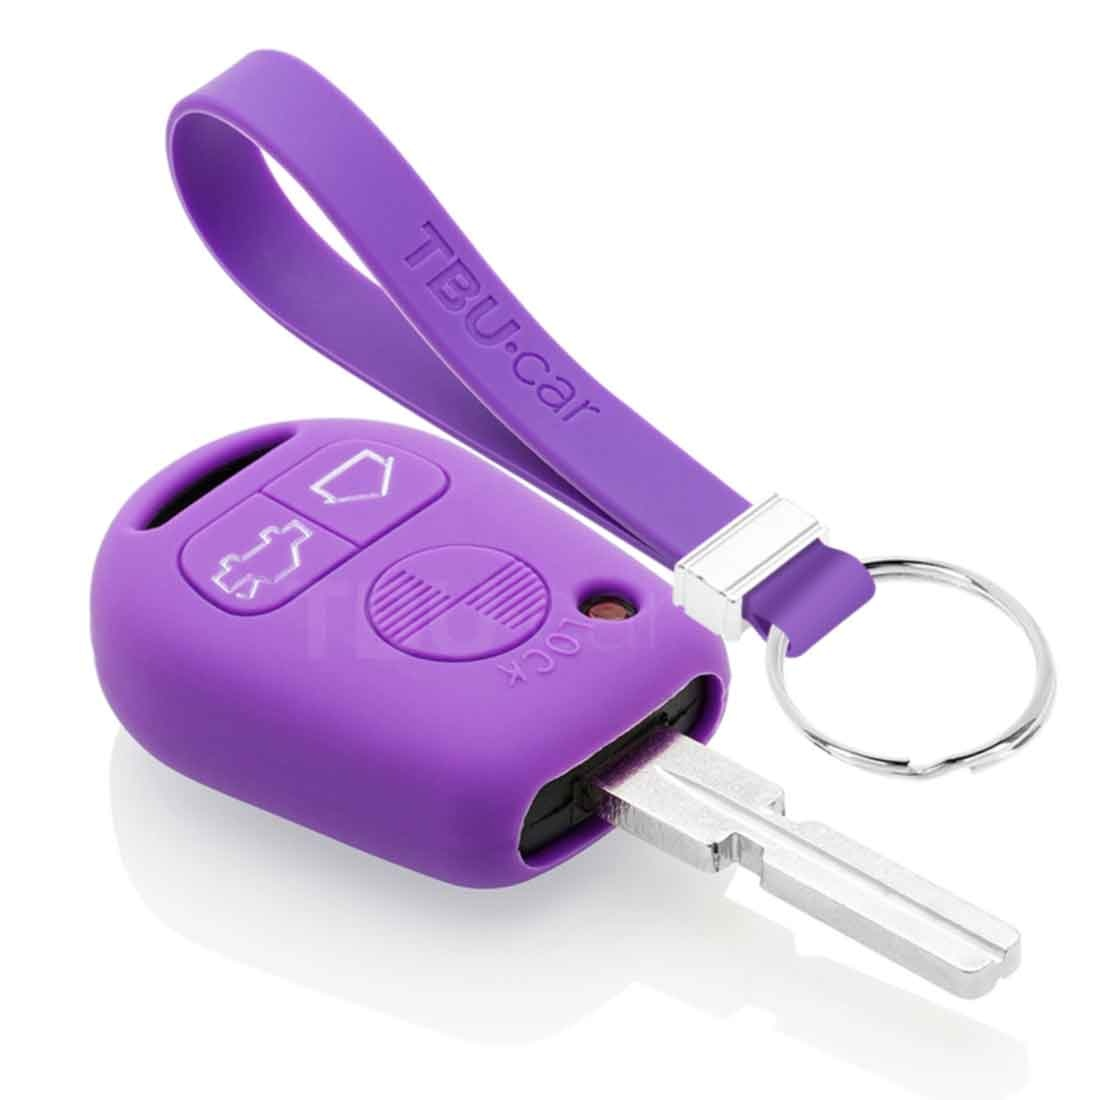 TBU car TBU car Autoschlüssel Hülle kompatibel mit BMW 3 Tasten - Schutzhülle aus Silikon - Auto Schlüsselhülle Cover in Violett